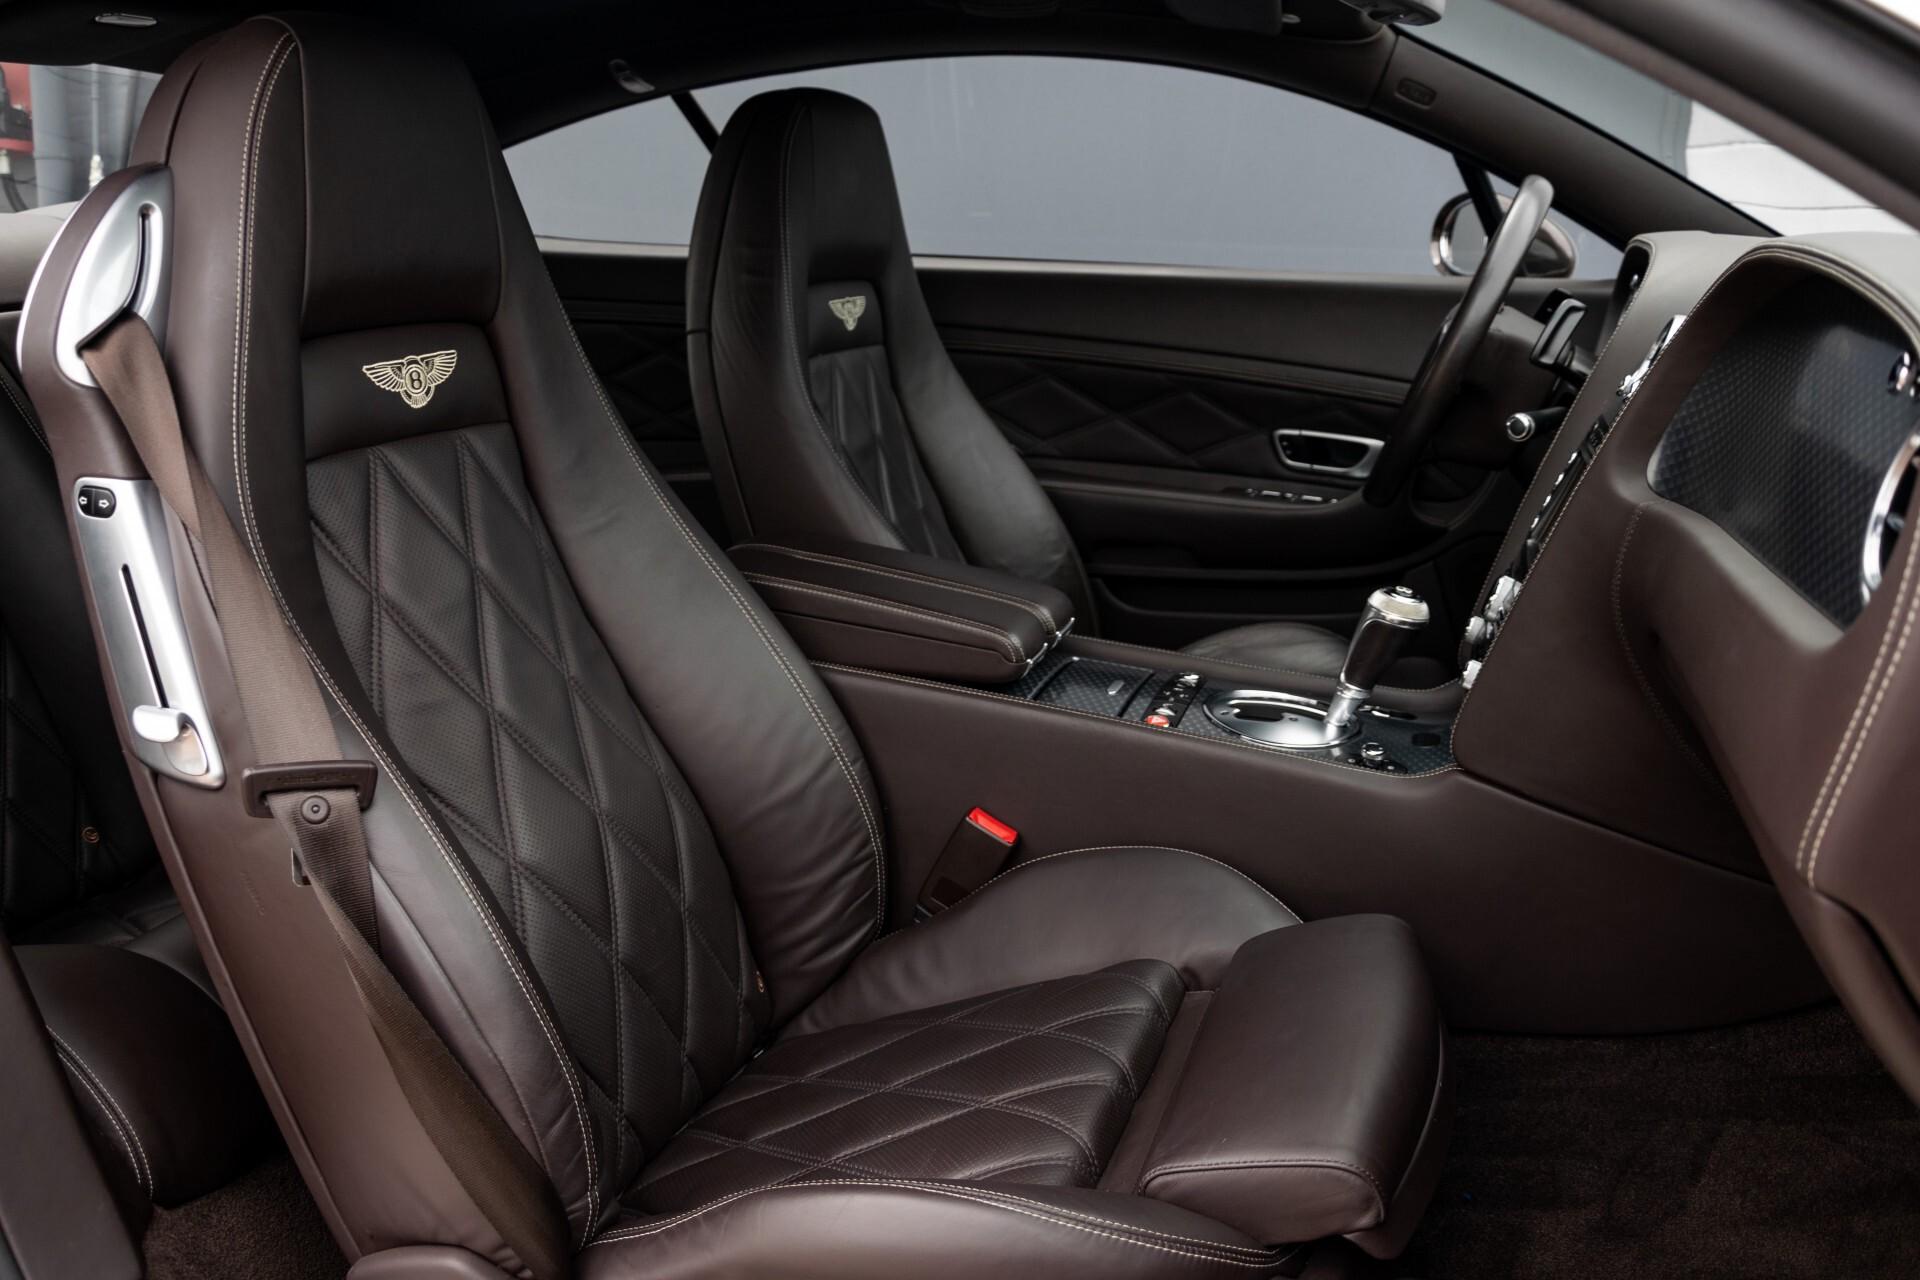 Bentley Continental GT 6.0 W12 GT Speed Ceramic Brakes/Mulliner/Standkachel/Keyless Aut6 Foto 3